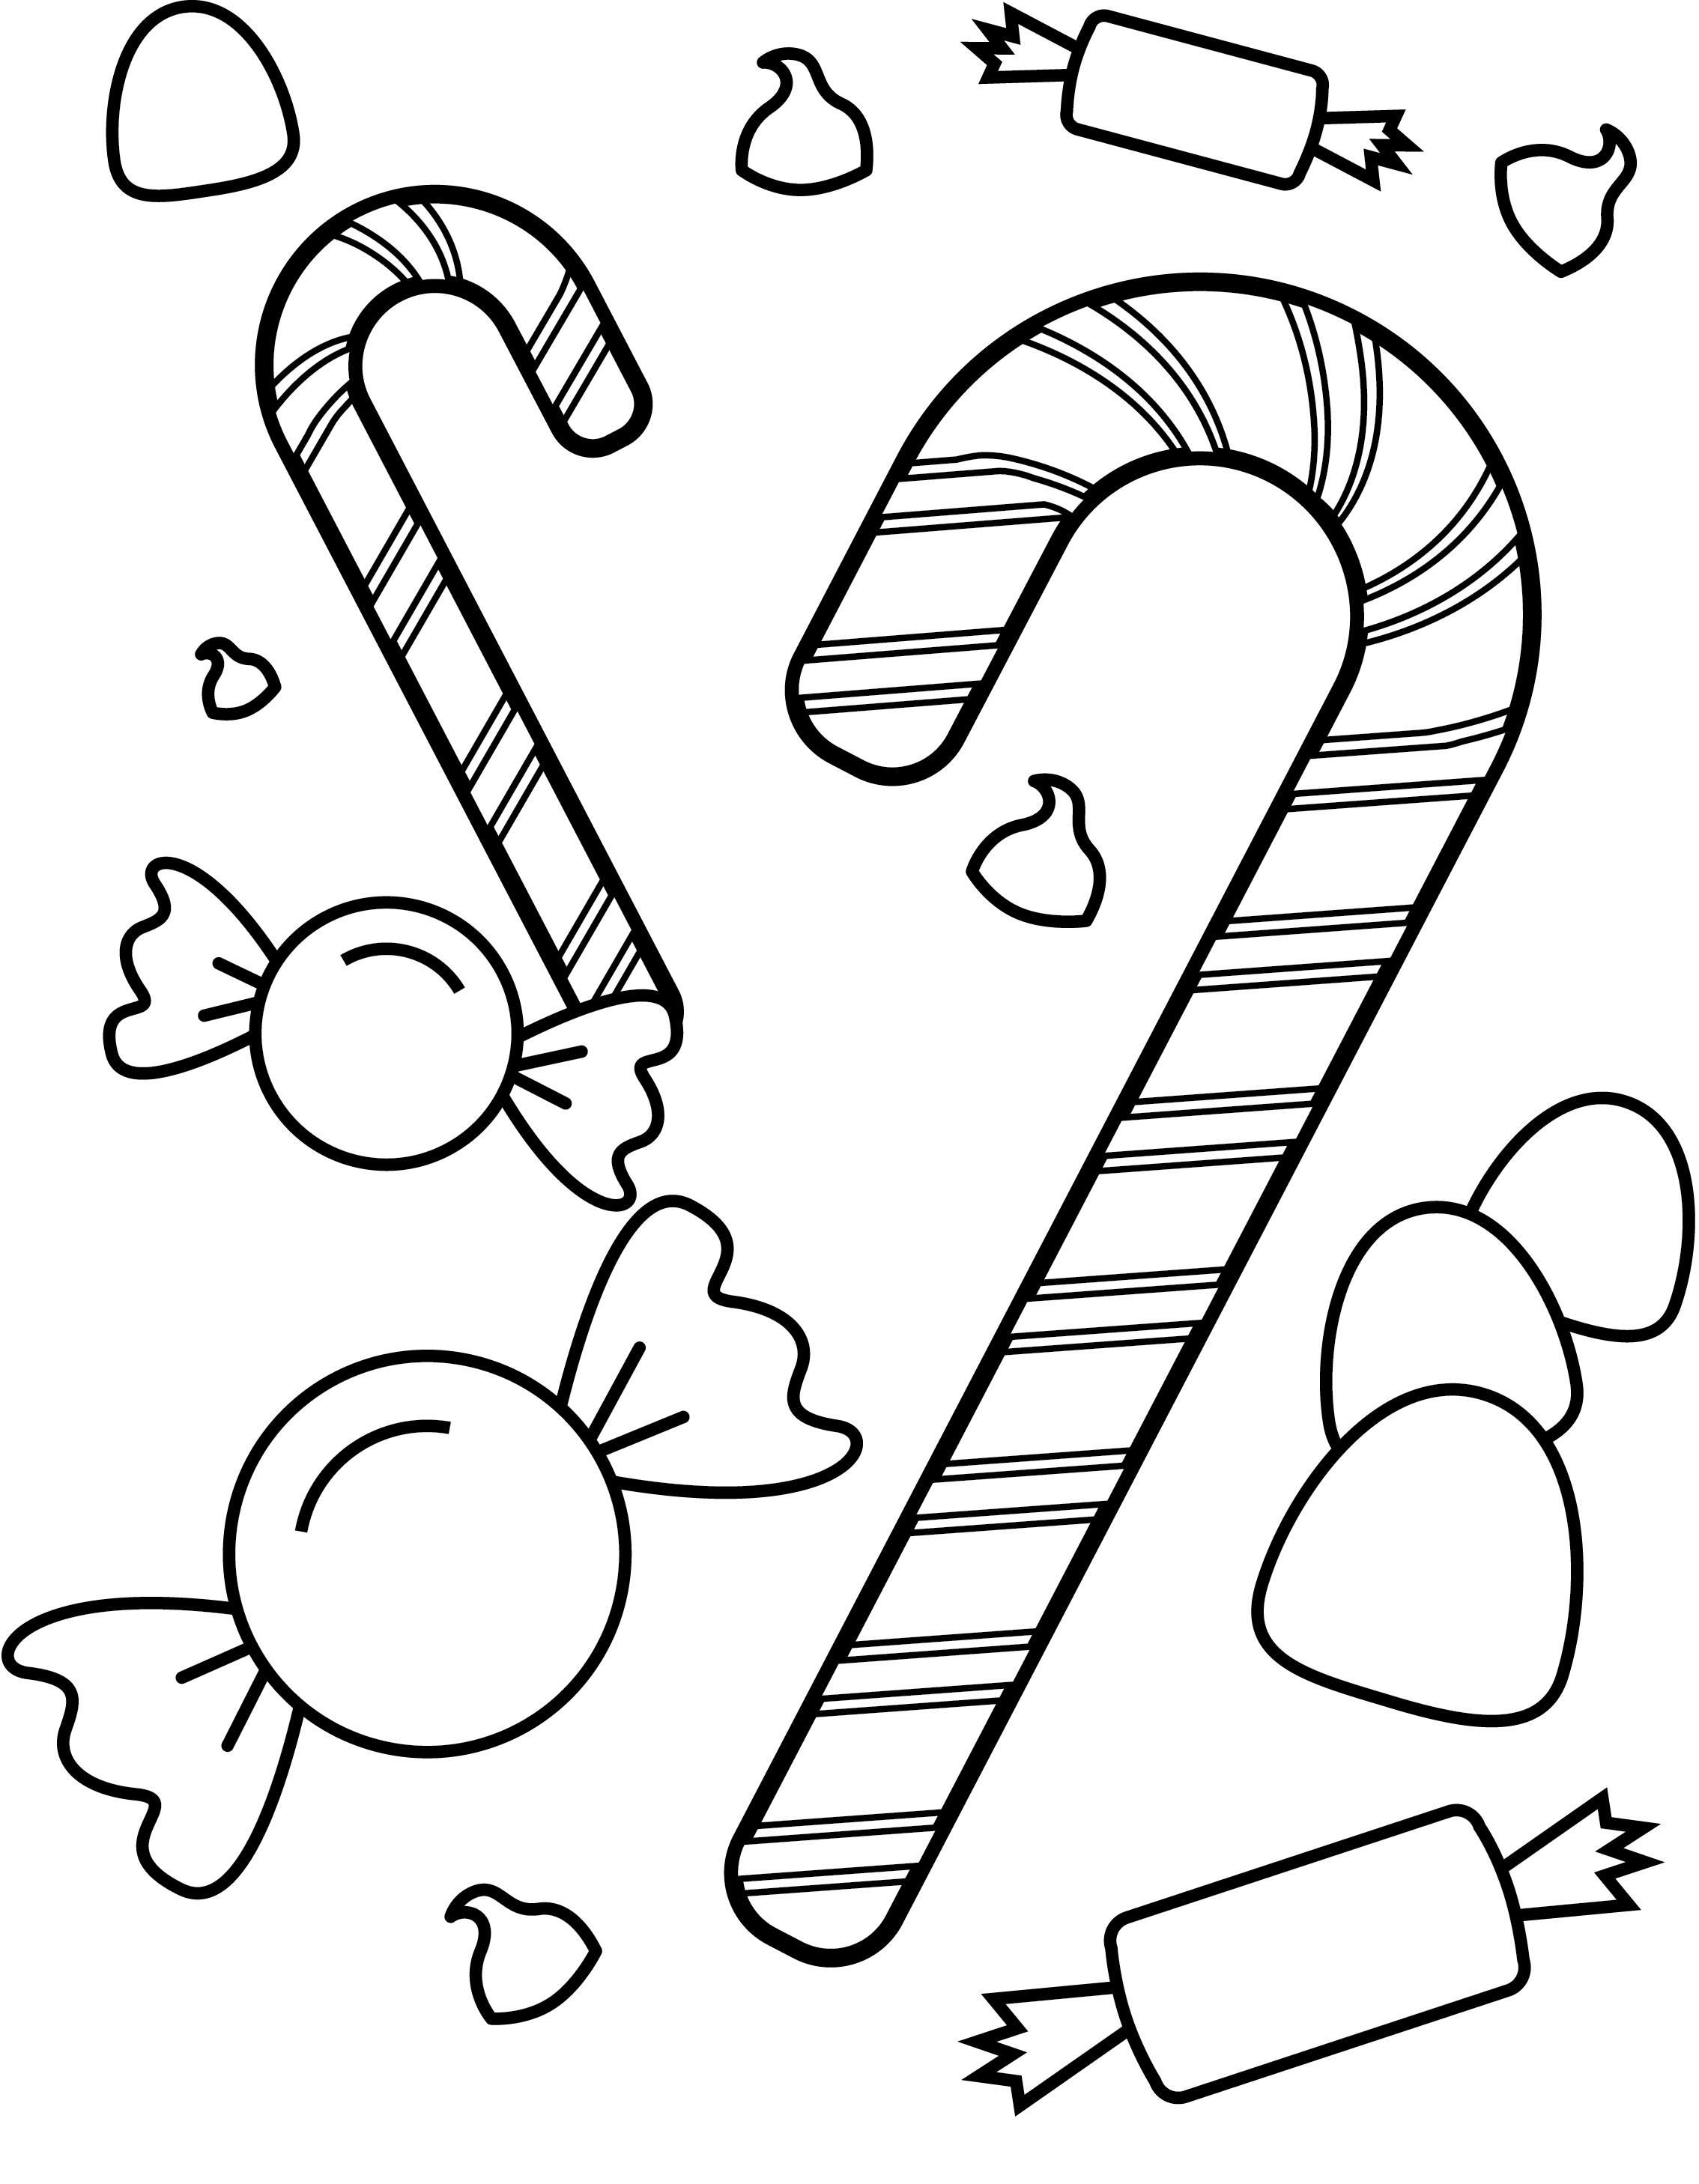 Christmas Candy Coloring Page Printable Free Printable Candy